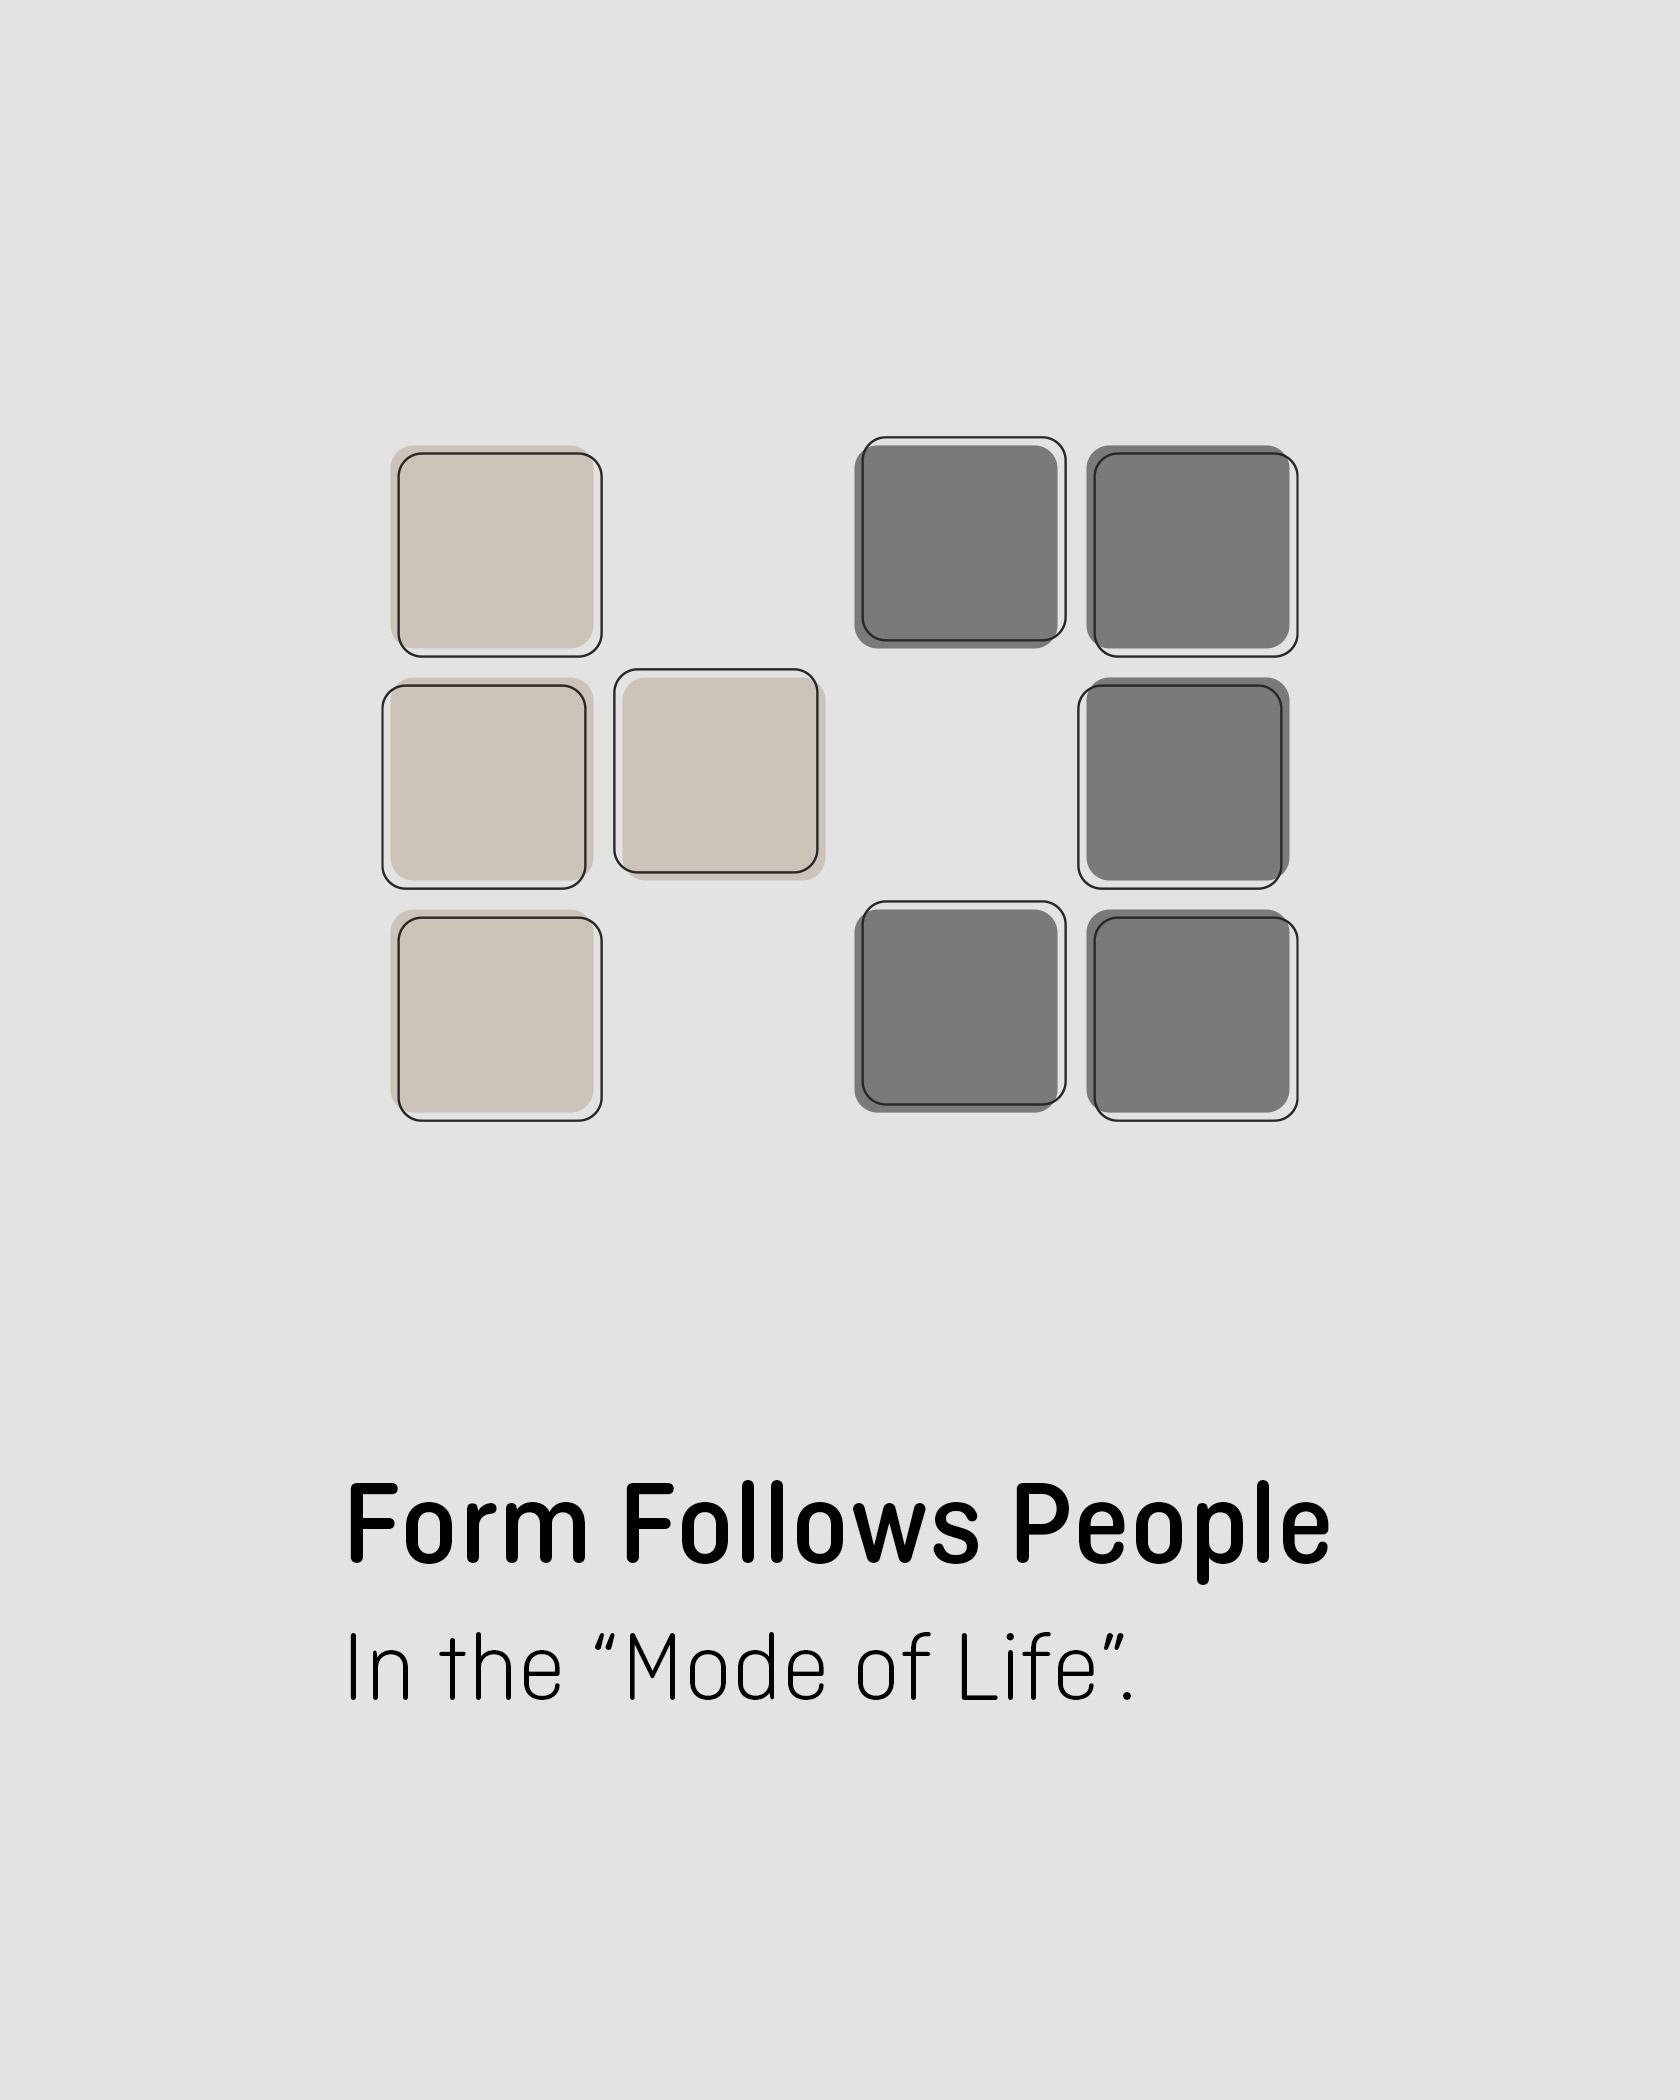 Form_Follows_People_Header_EN_1